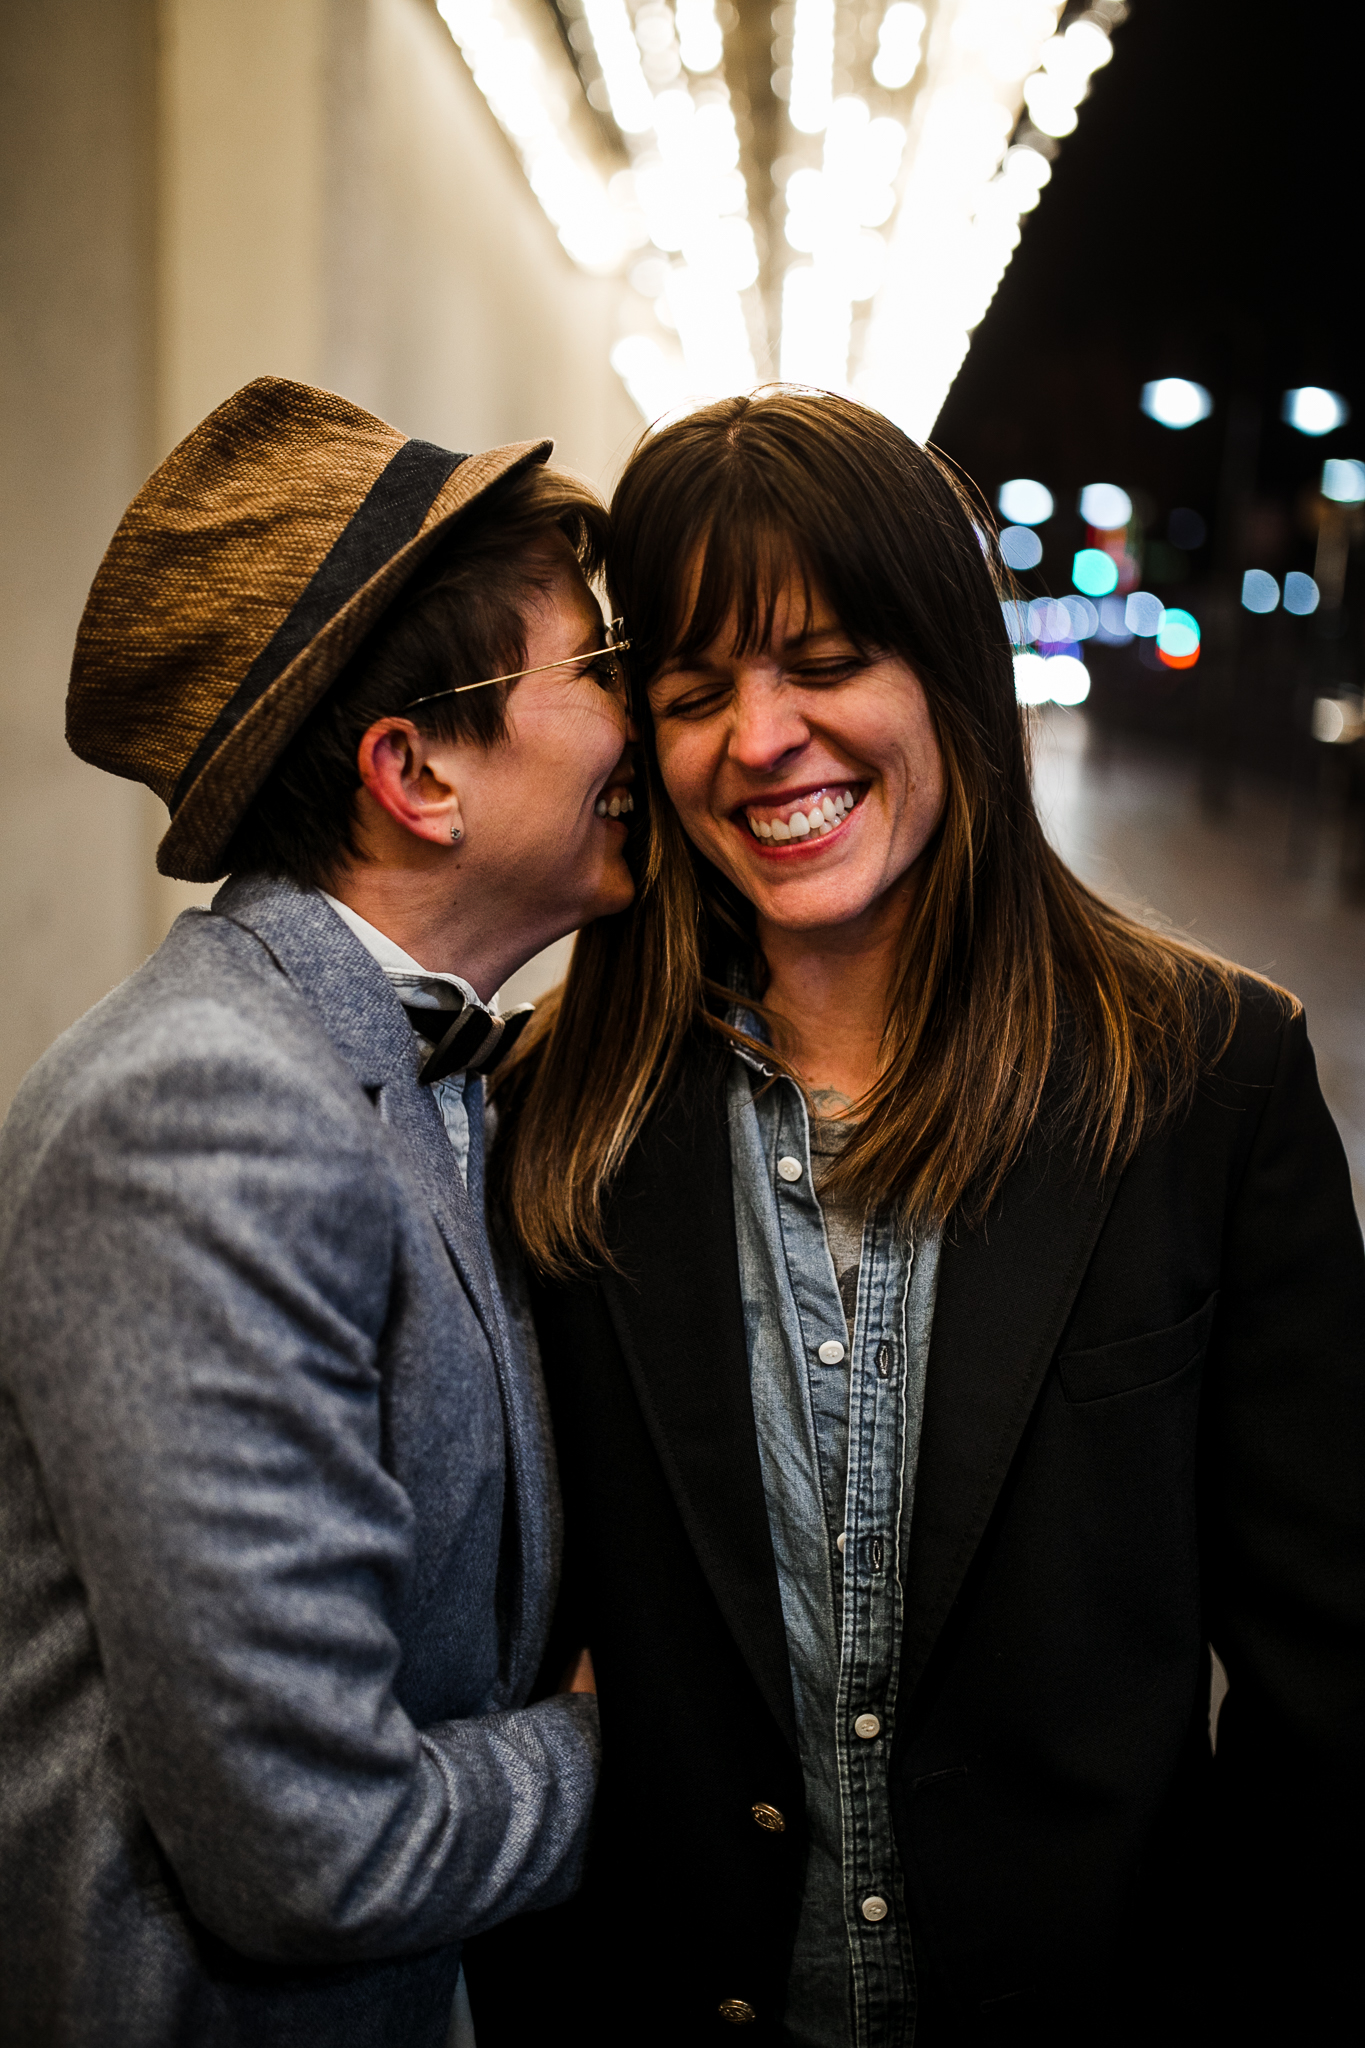 Archer Inspired Photography Hilary and Gia LGTBQ Reno Nevada Couple Wedding Engagement Photographer-17.jpg